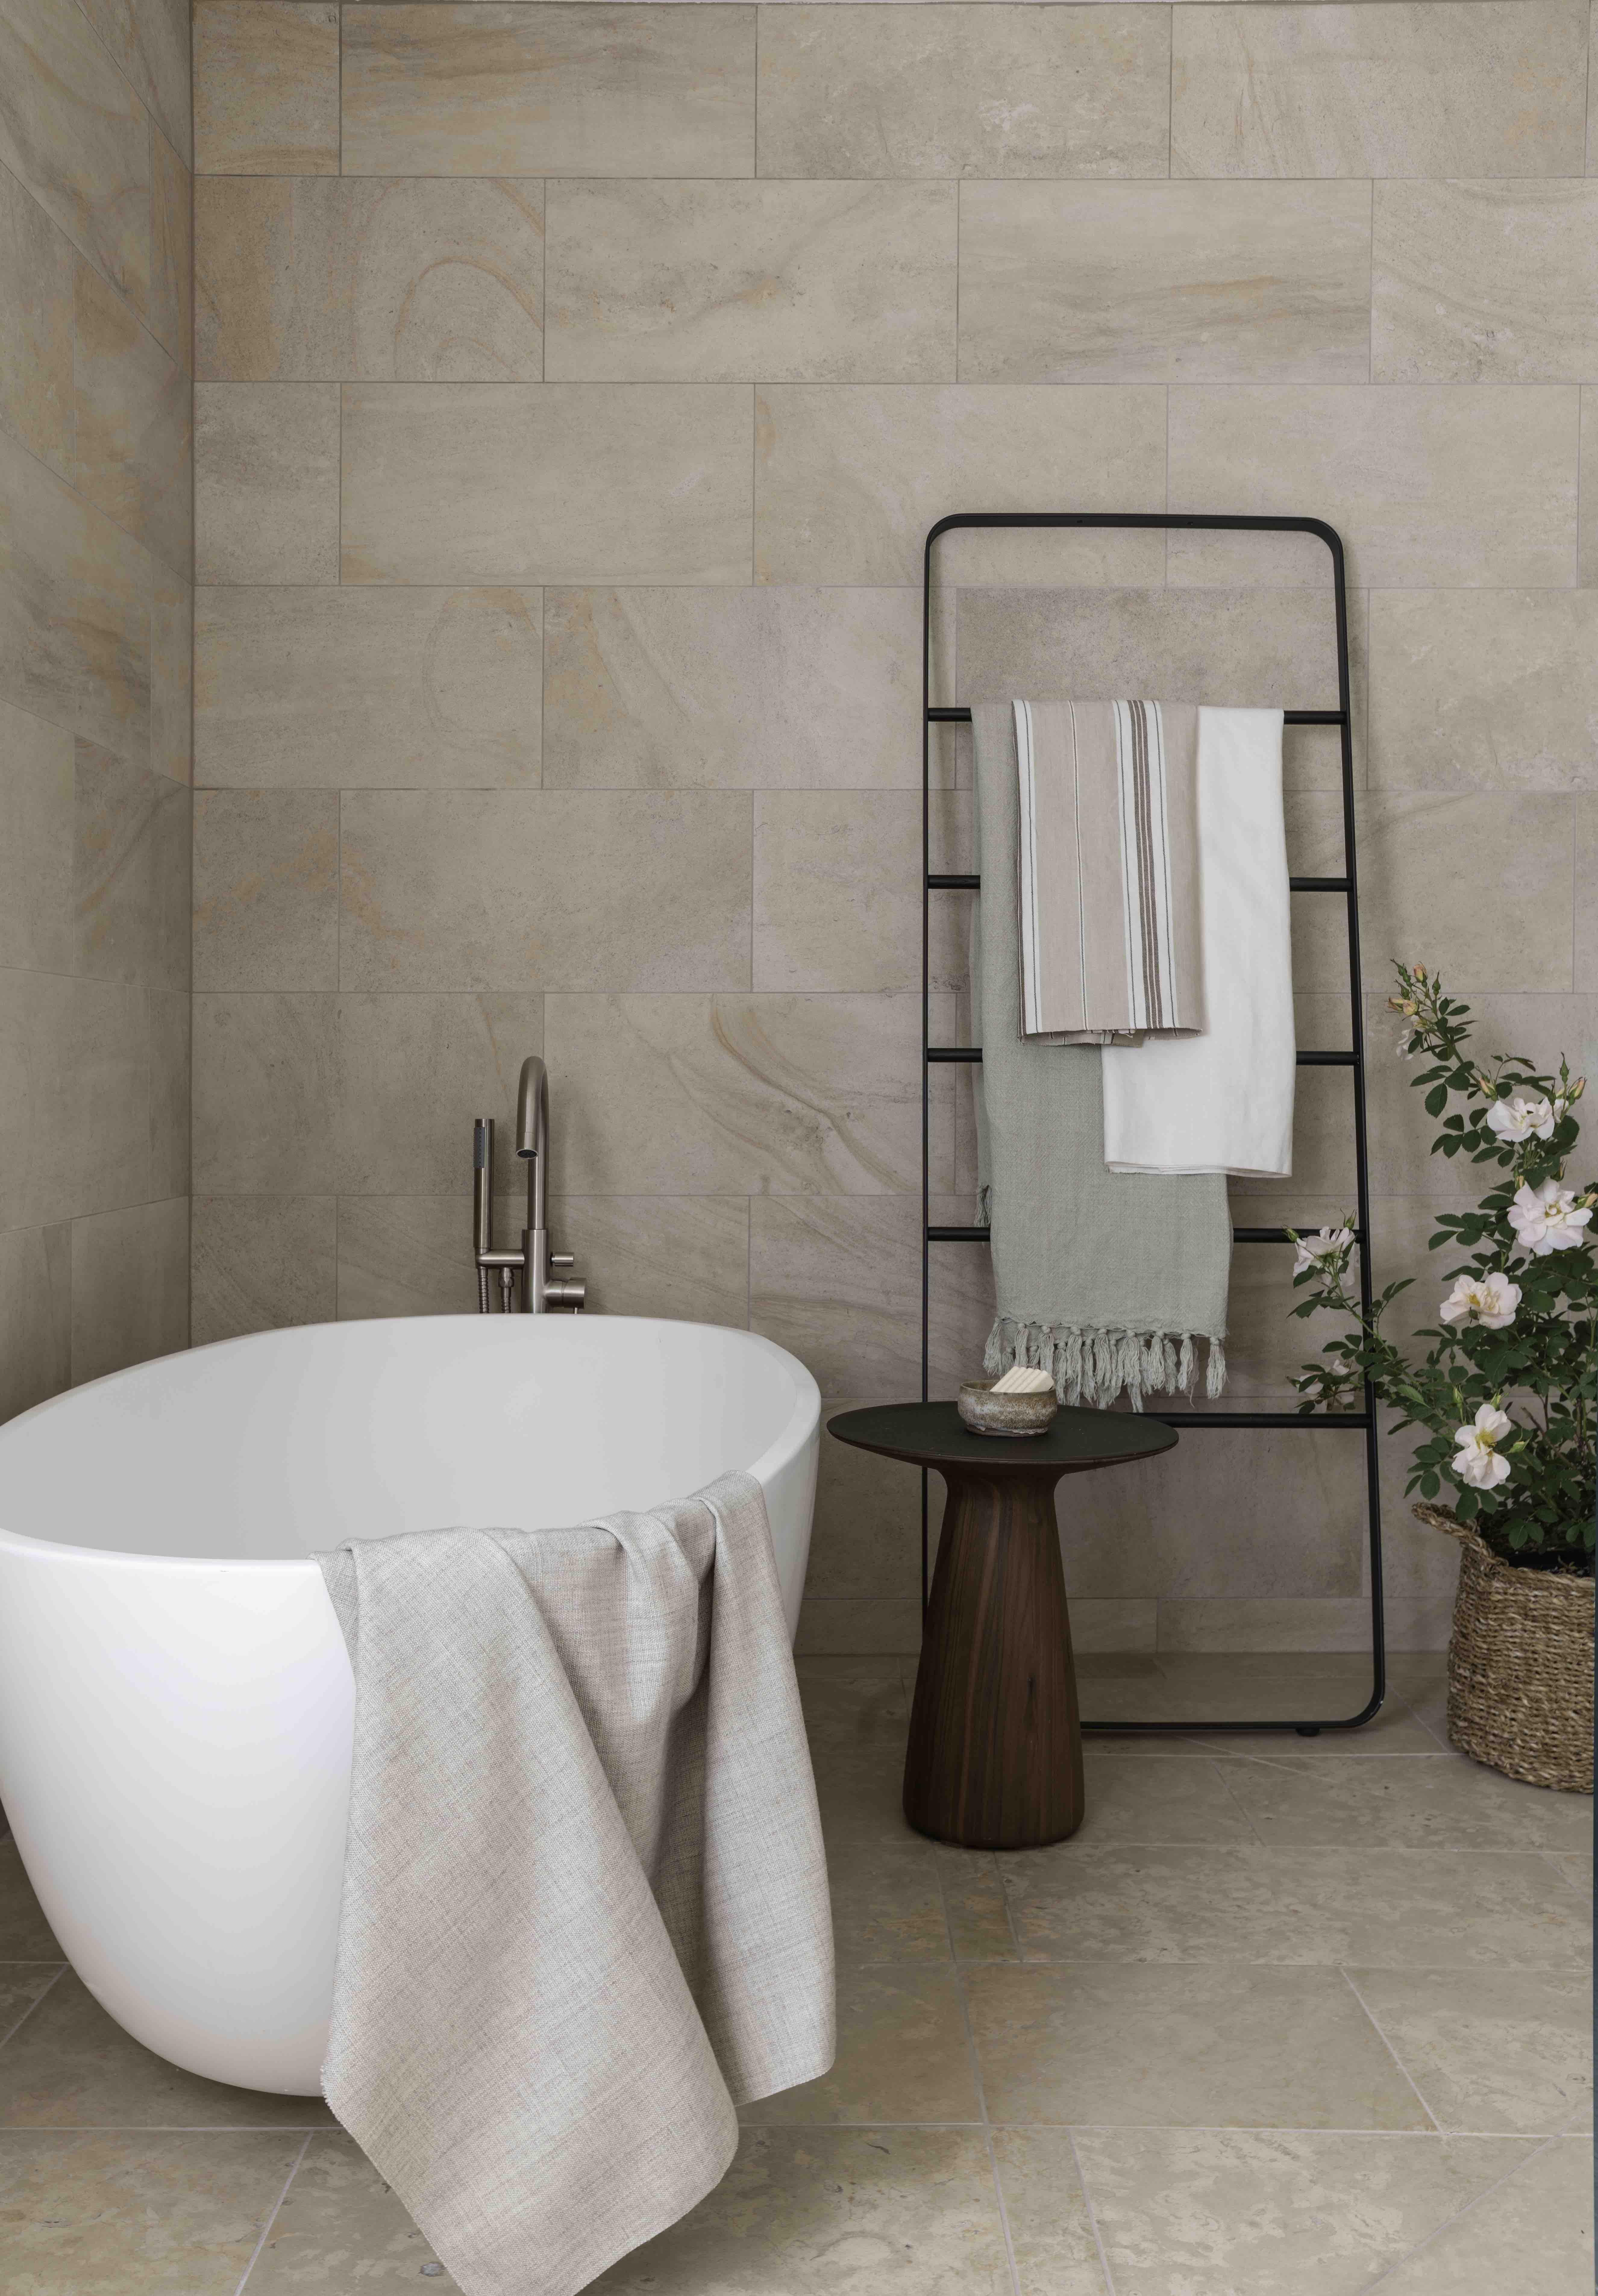 TRIB_Targhee_Master-Bath-1-copy-2